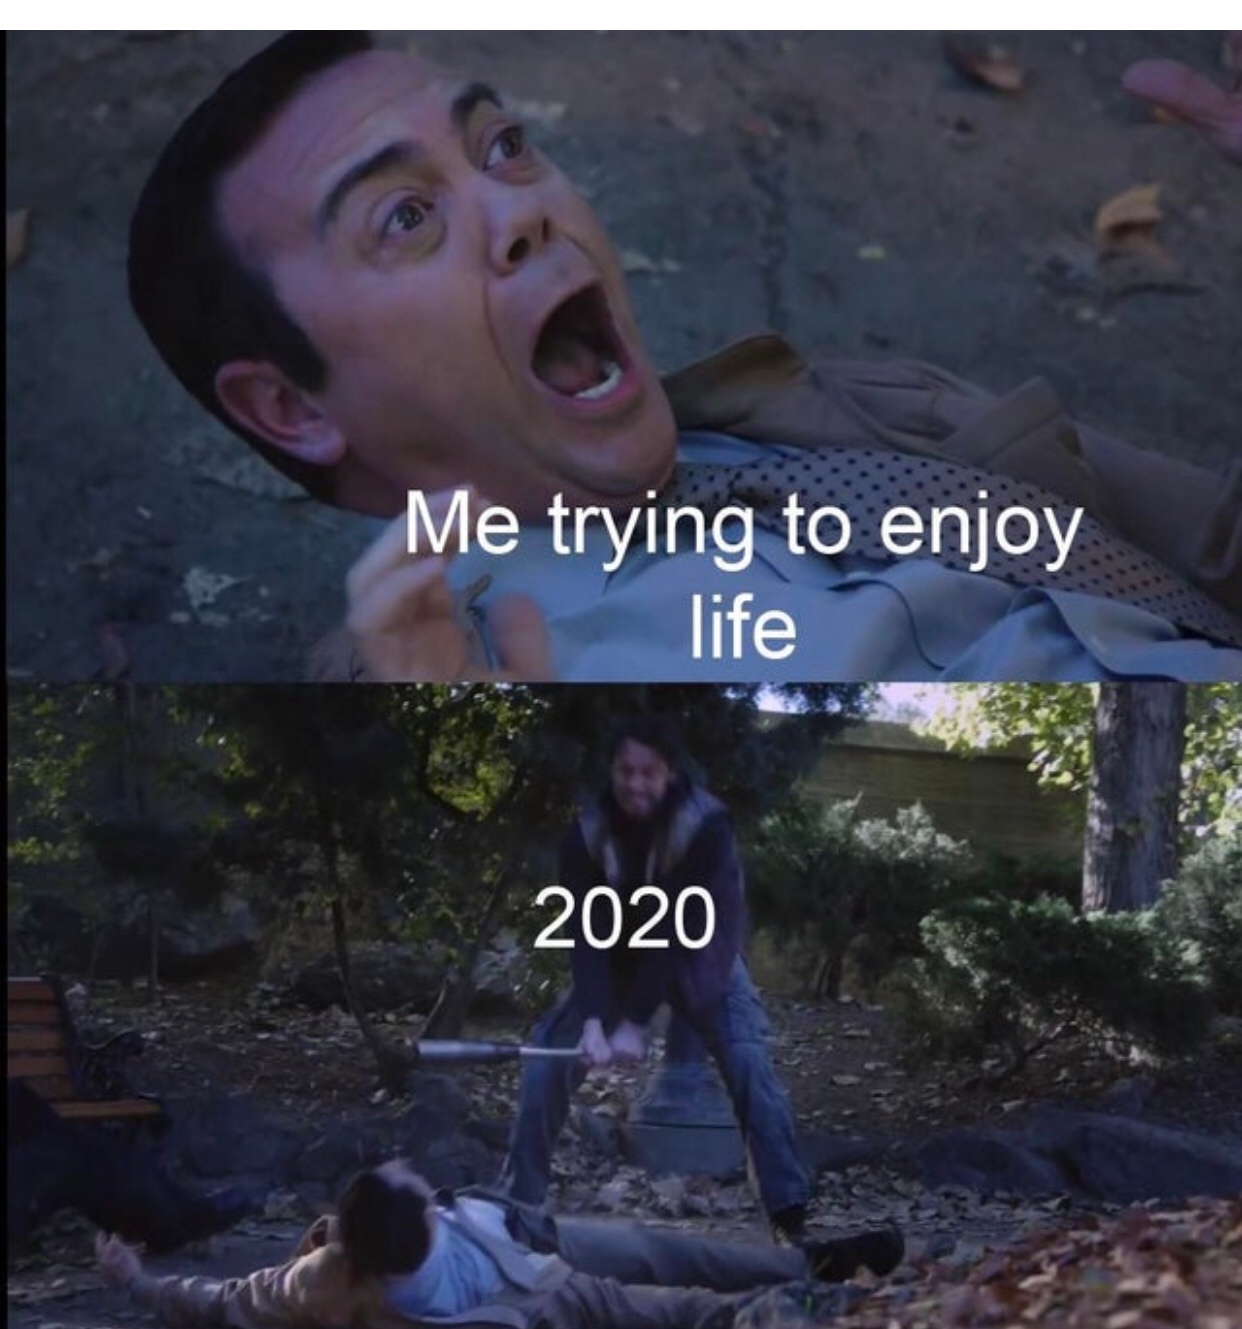 2020 sucks - meme